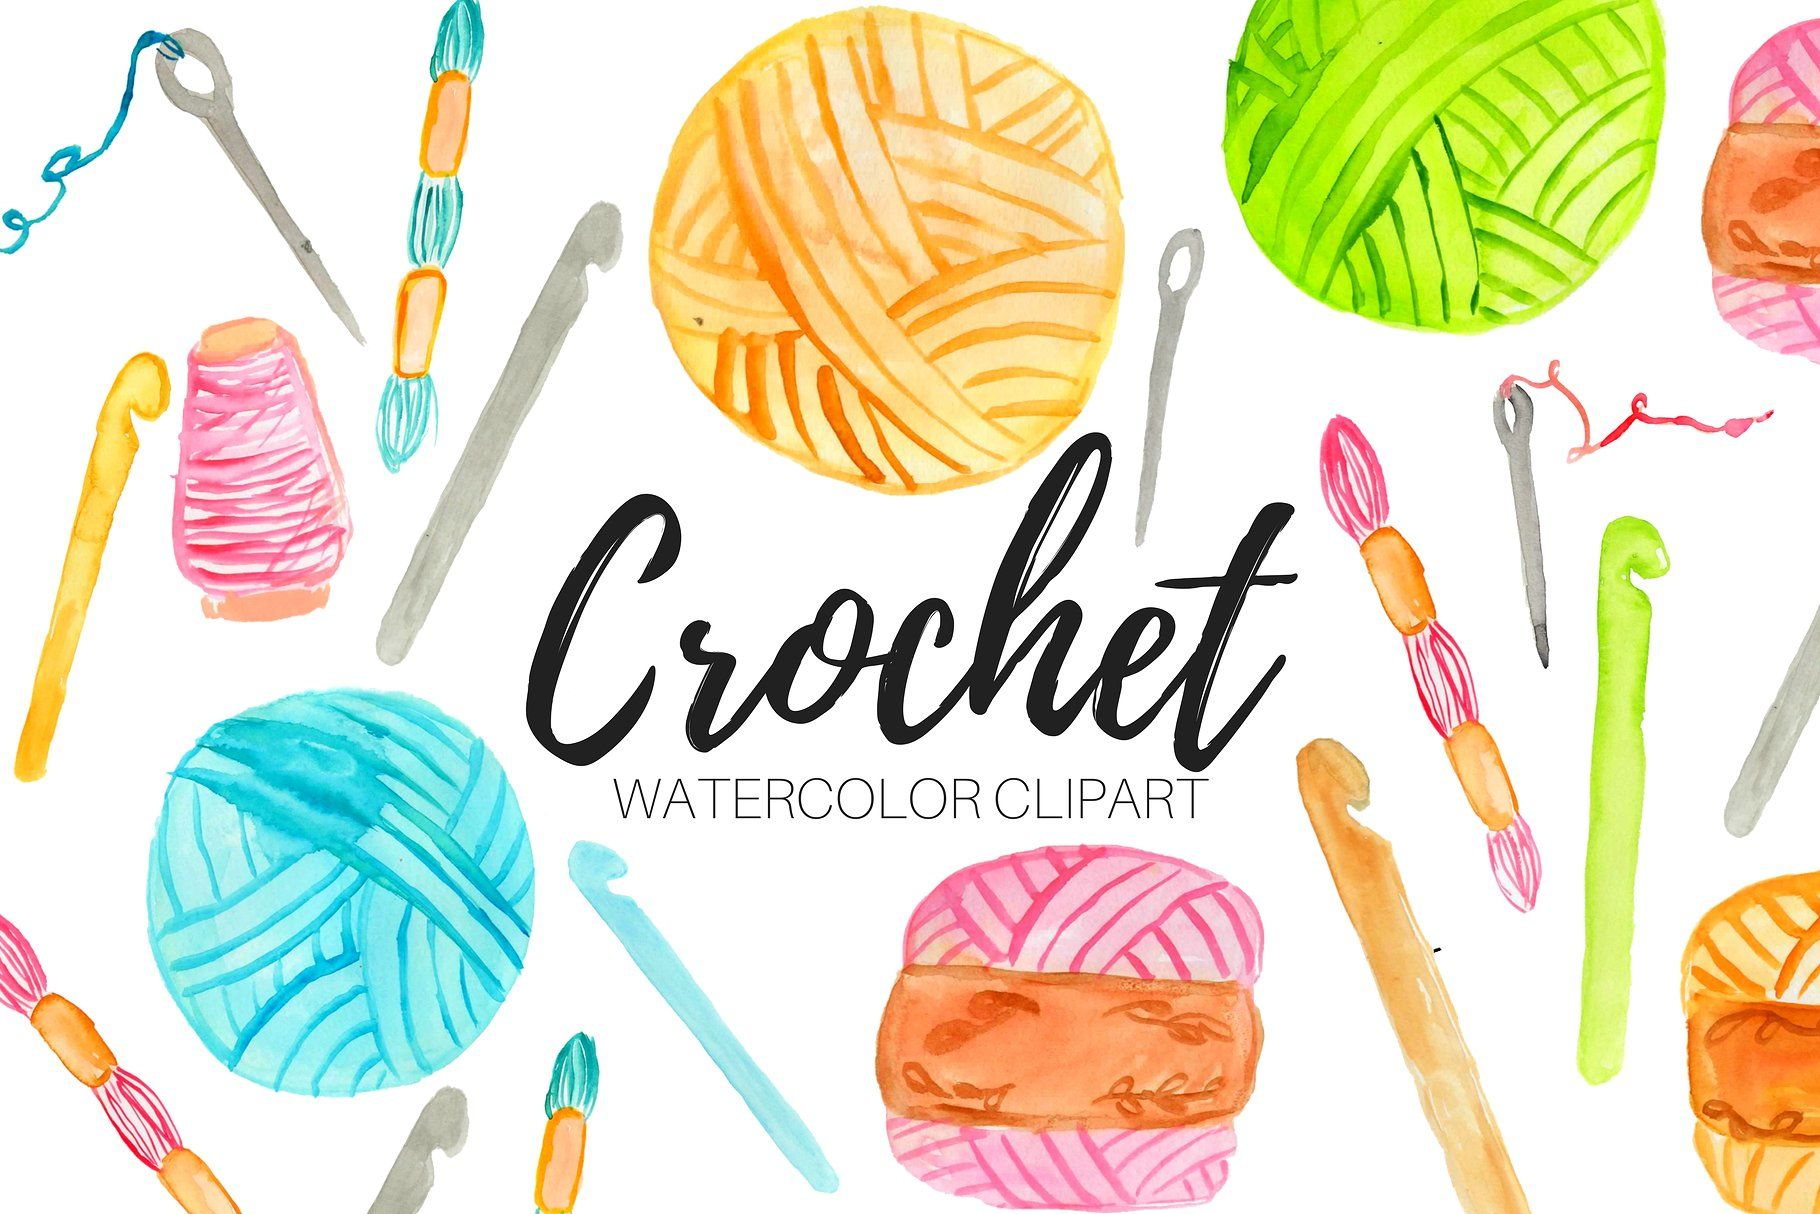 Watercolor Crochet Clipart #backgrounds#Perfect#sticker.